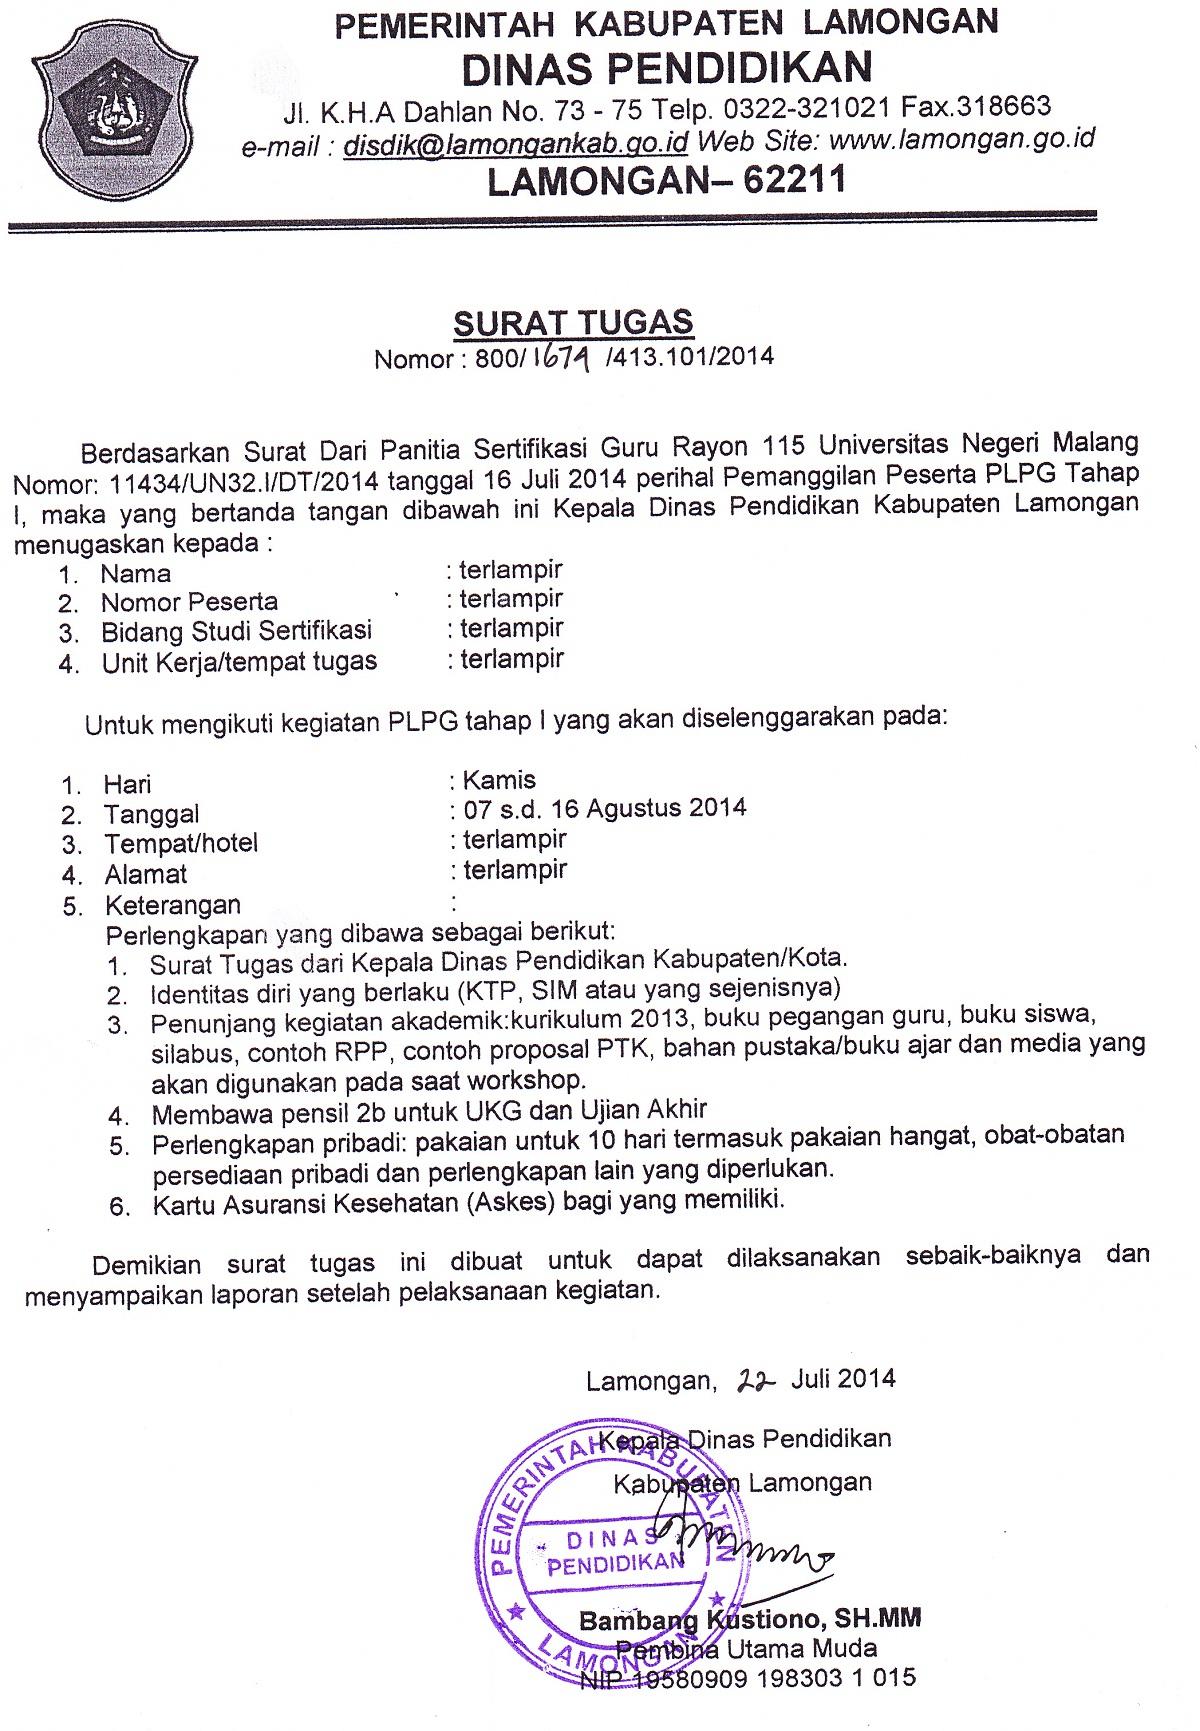 Cpns Kab Malang Bkd Kabupaten Malang Malang Di Undang Ke Dinas Pendidikan Kab Lamongan Di Ruangan Krida